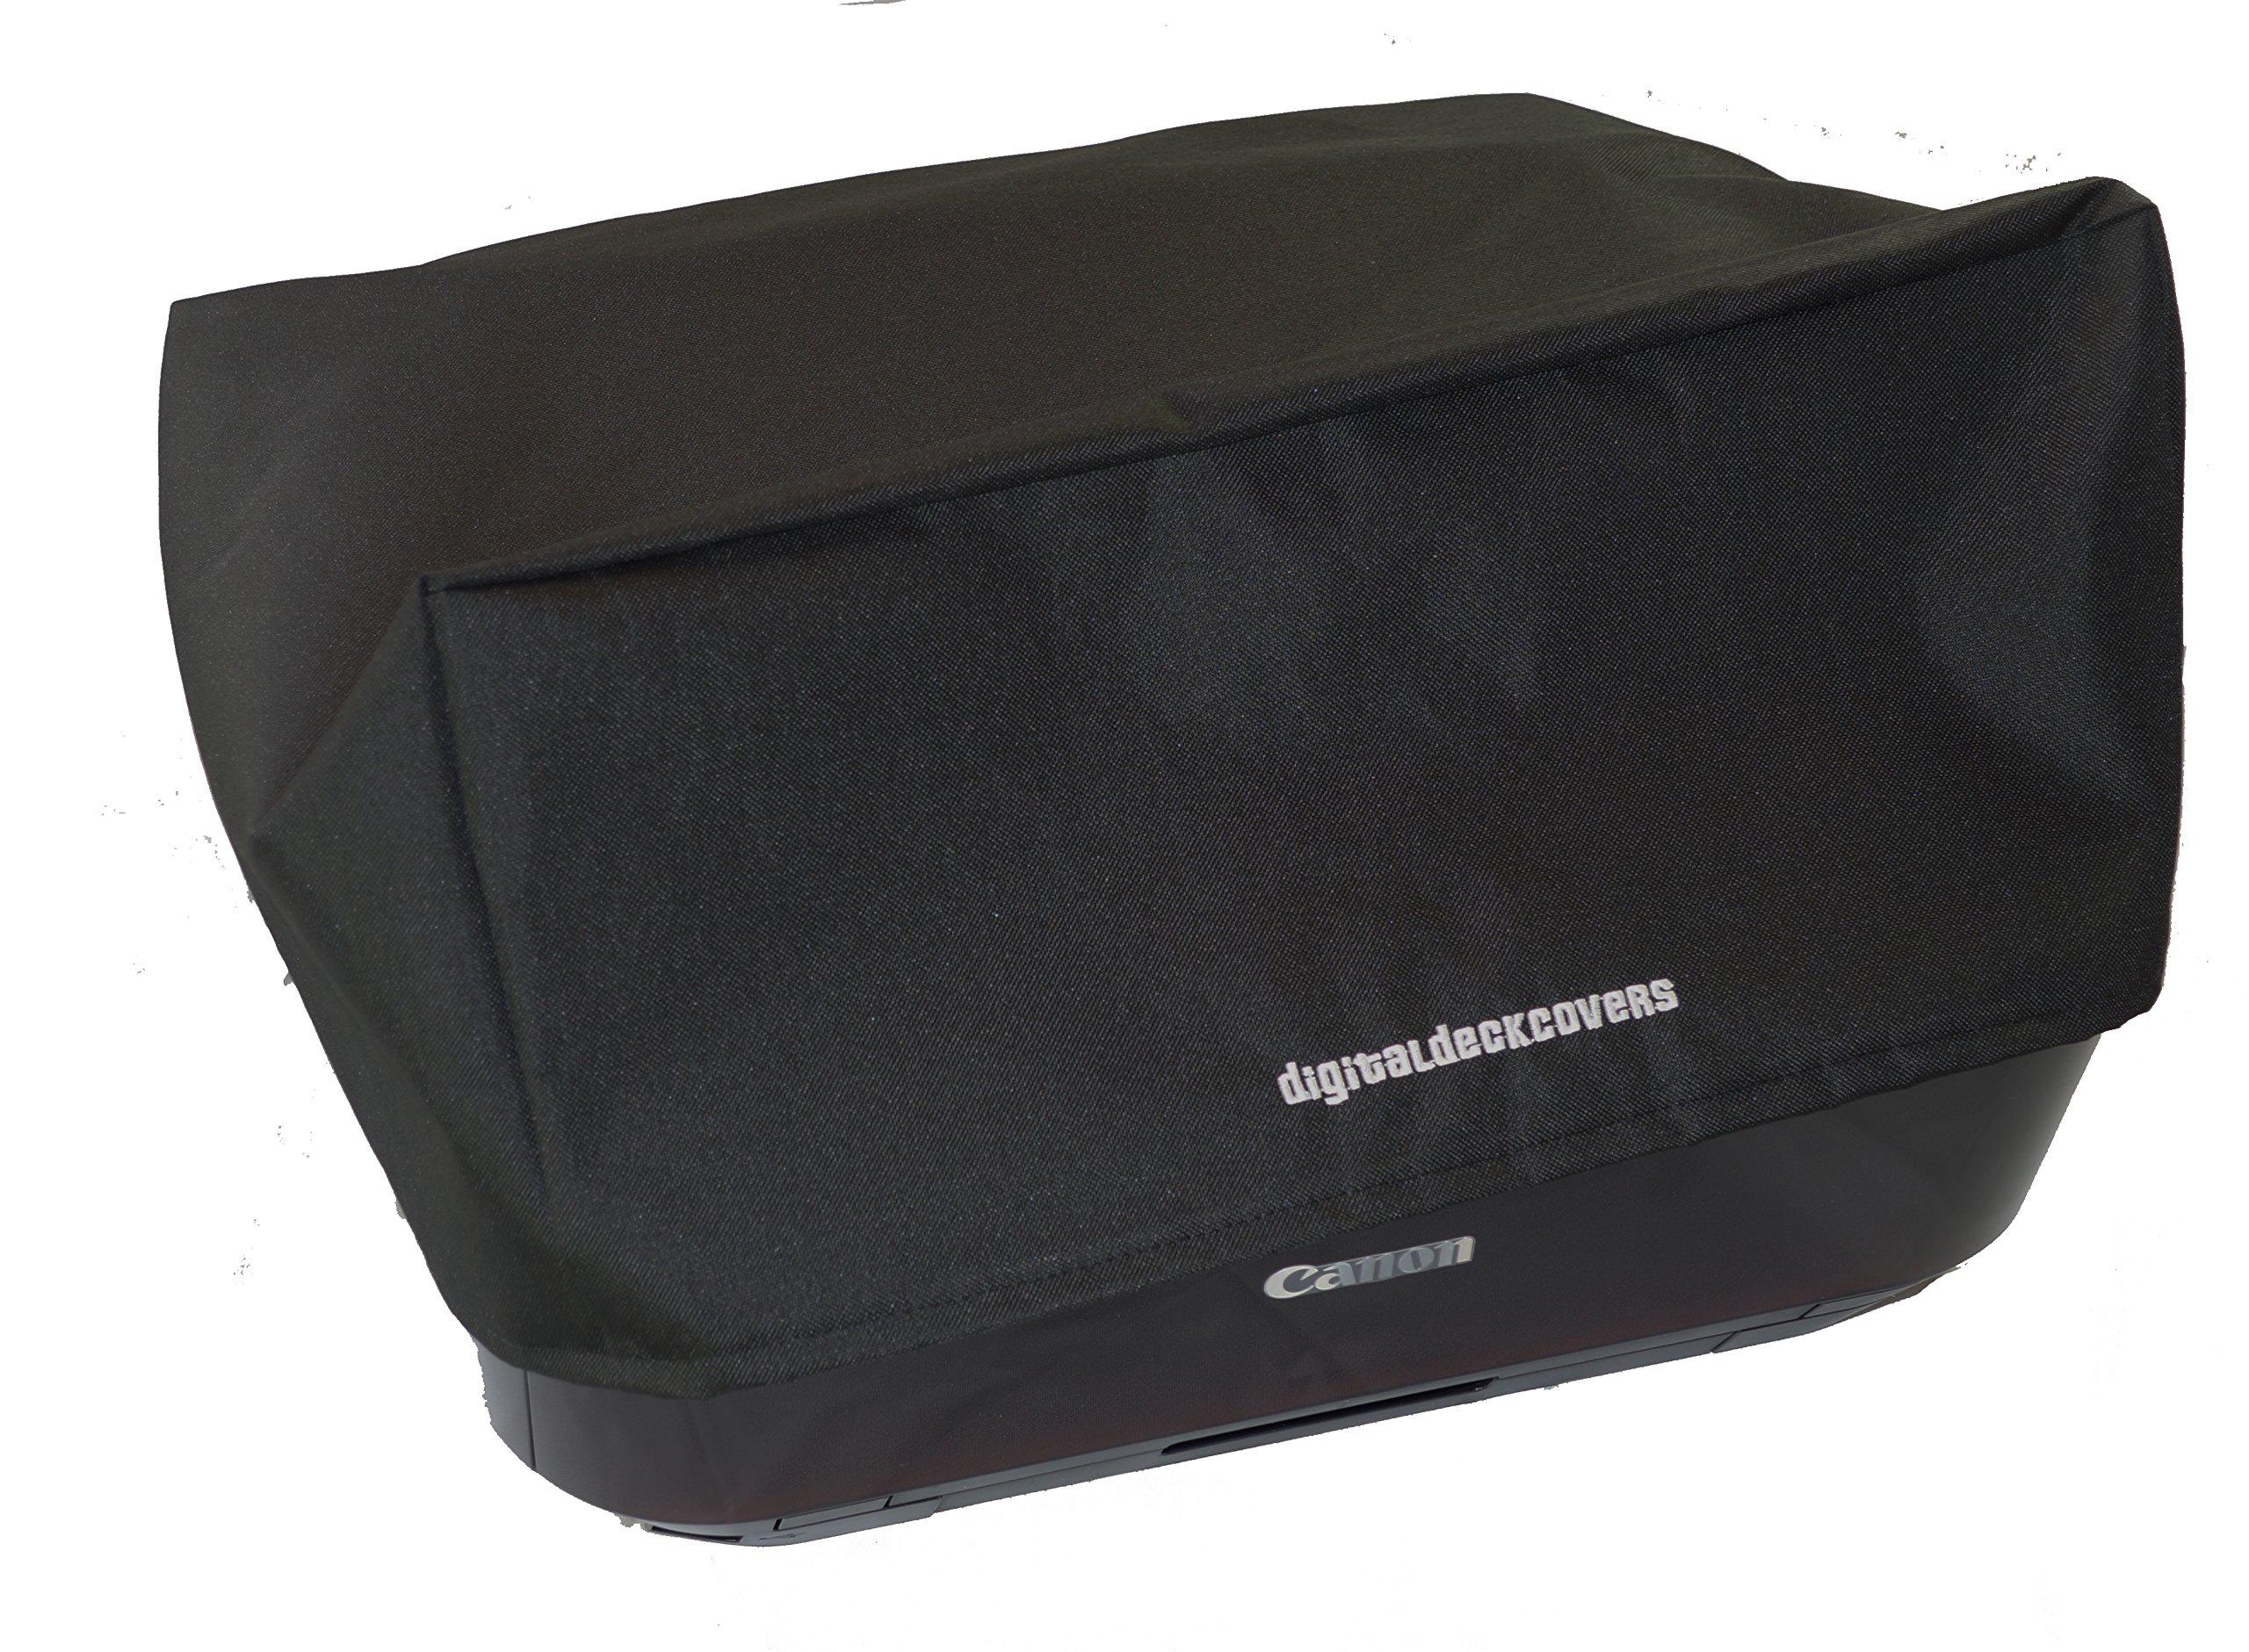 DigitalDeckCovers Printer Dust Cover for Canon Pixma MX722 / MX922 / MX925 / MX926 Printers [Antistatic, Water Resistant, Heavy Duty Premium Fabric, Black]